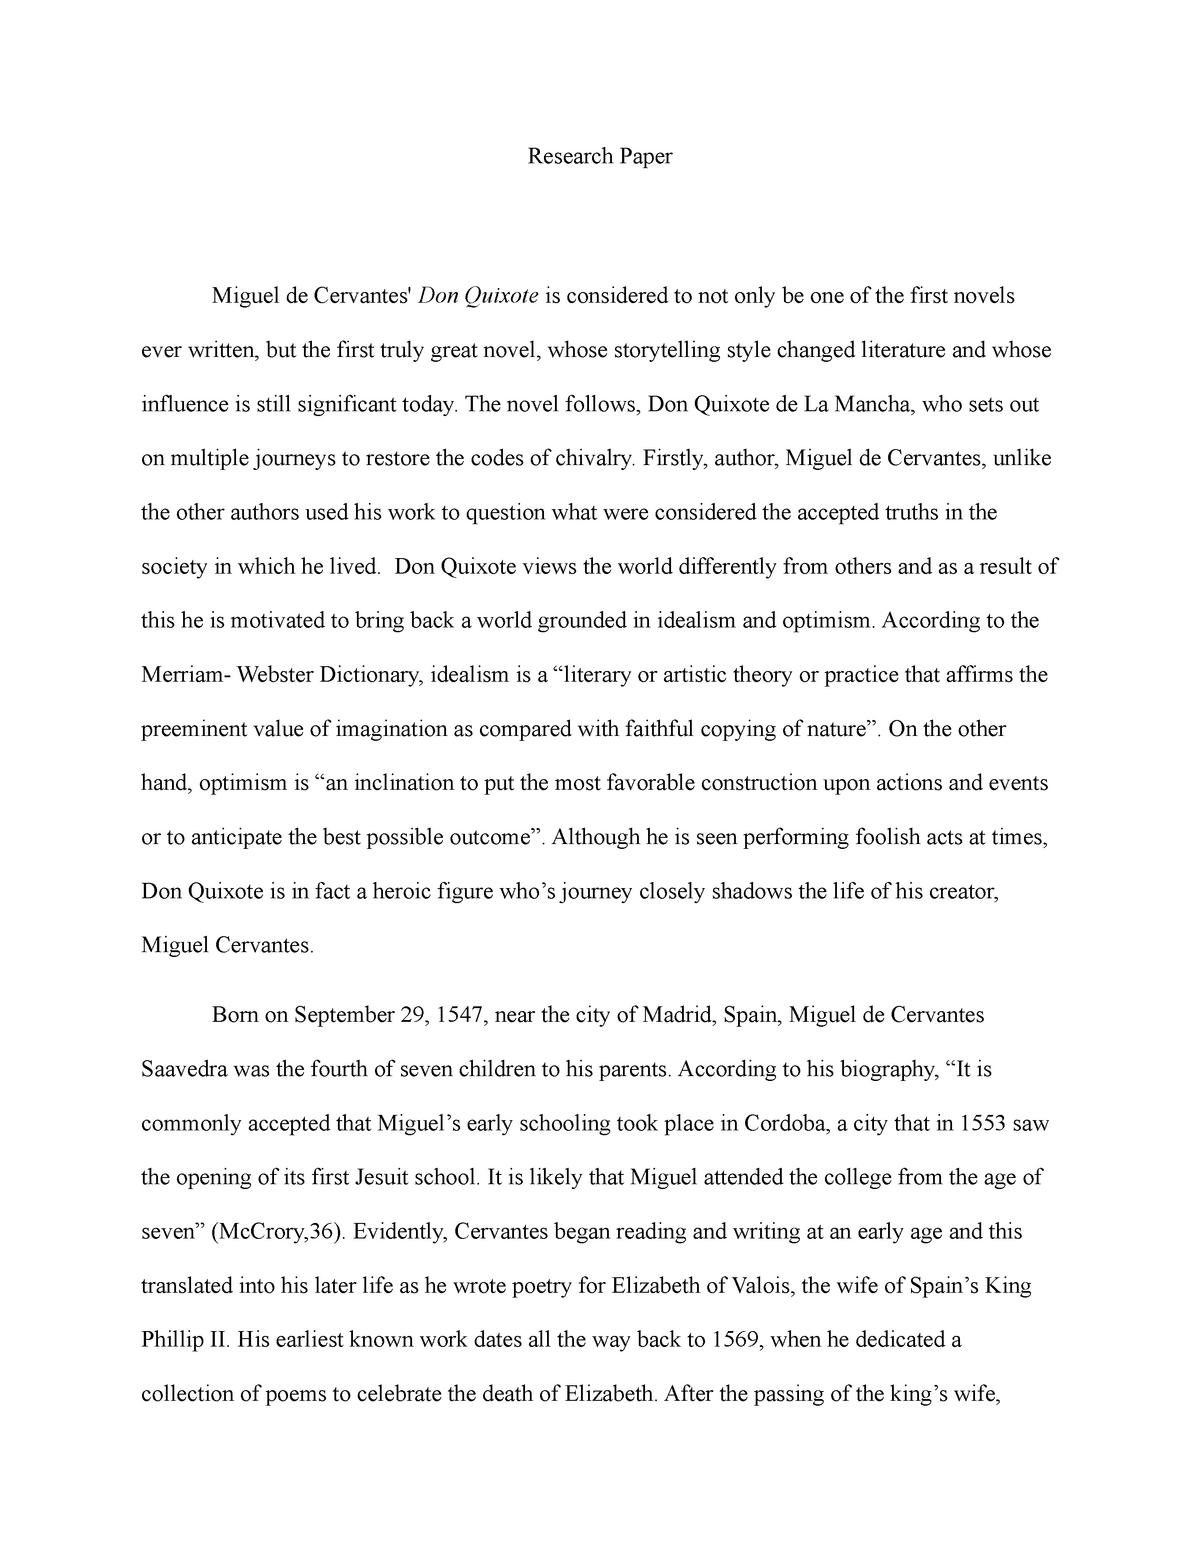 Don quixote research paper benefit of breakfast essay